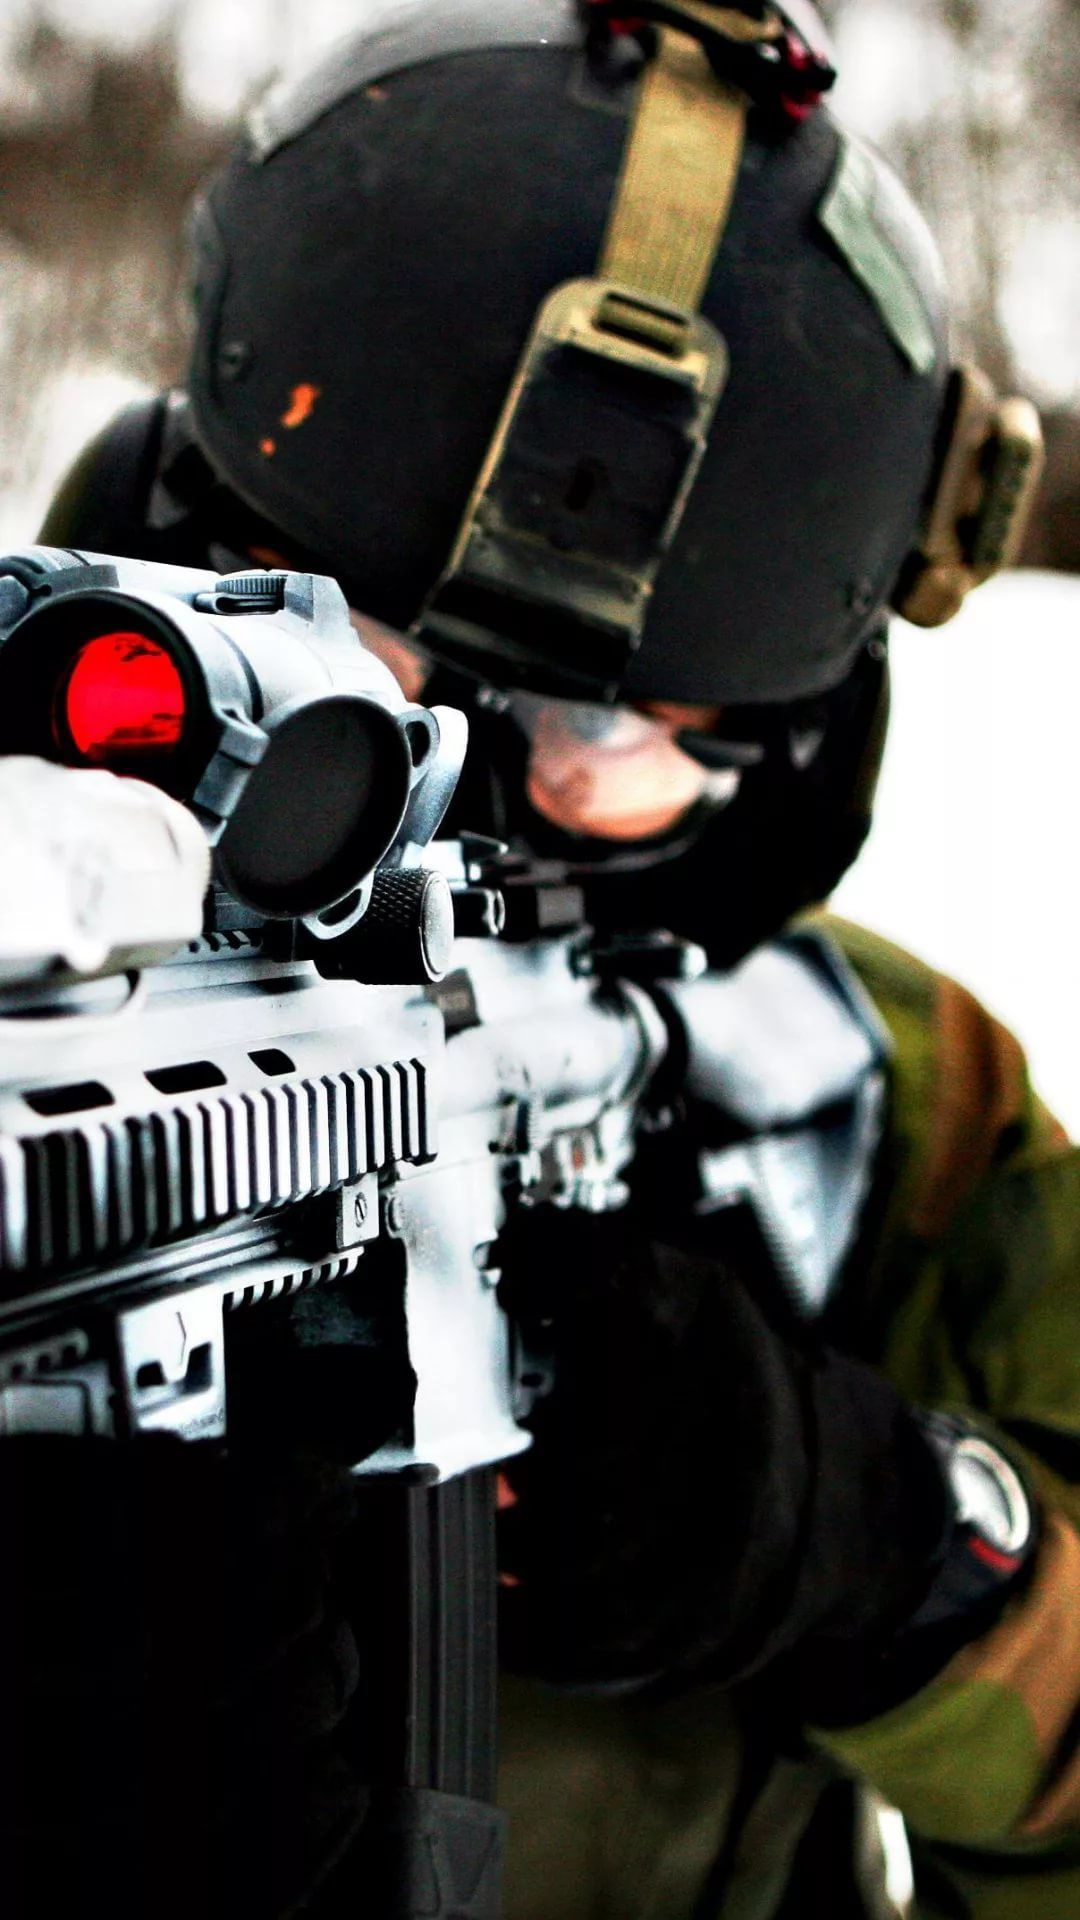 16 American Sniper Iphone Wallpapers Wallpaperboat